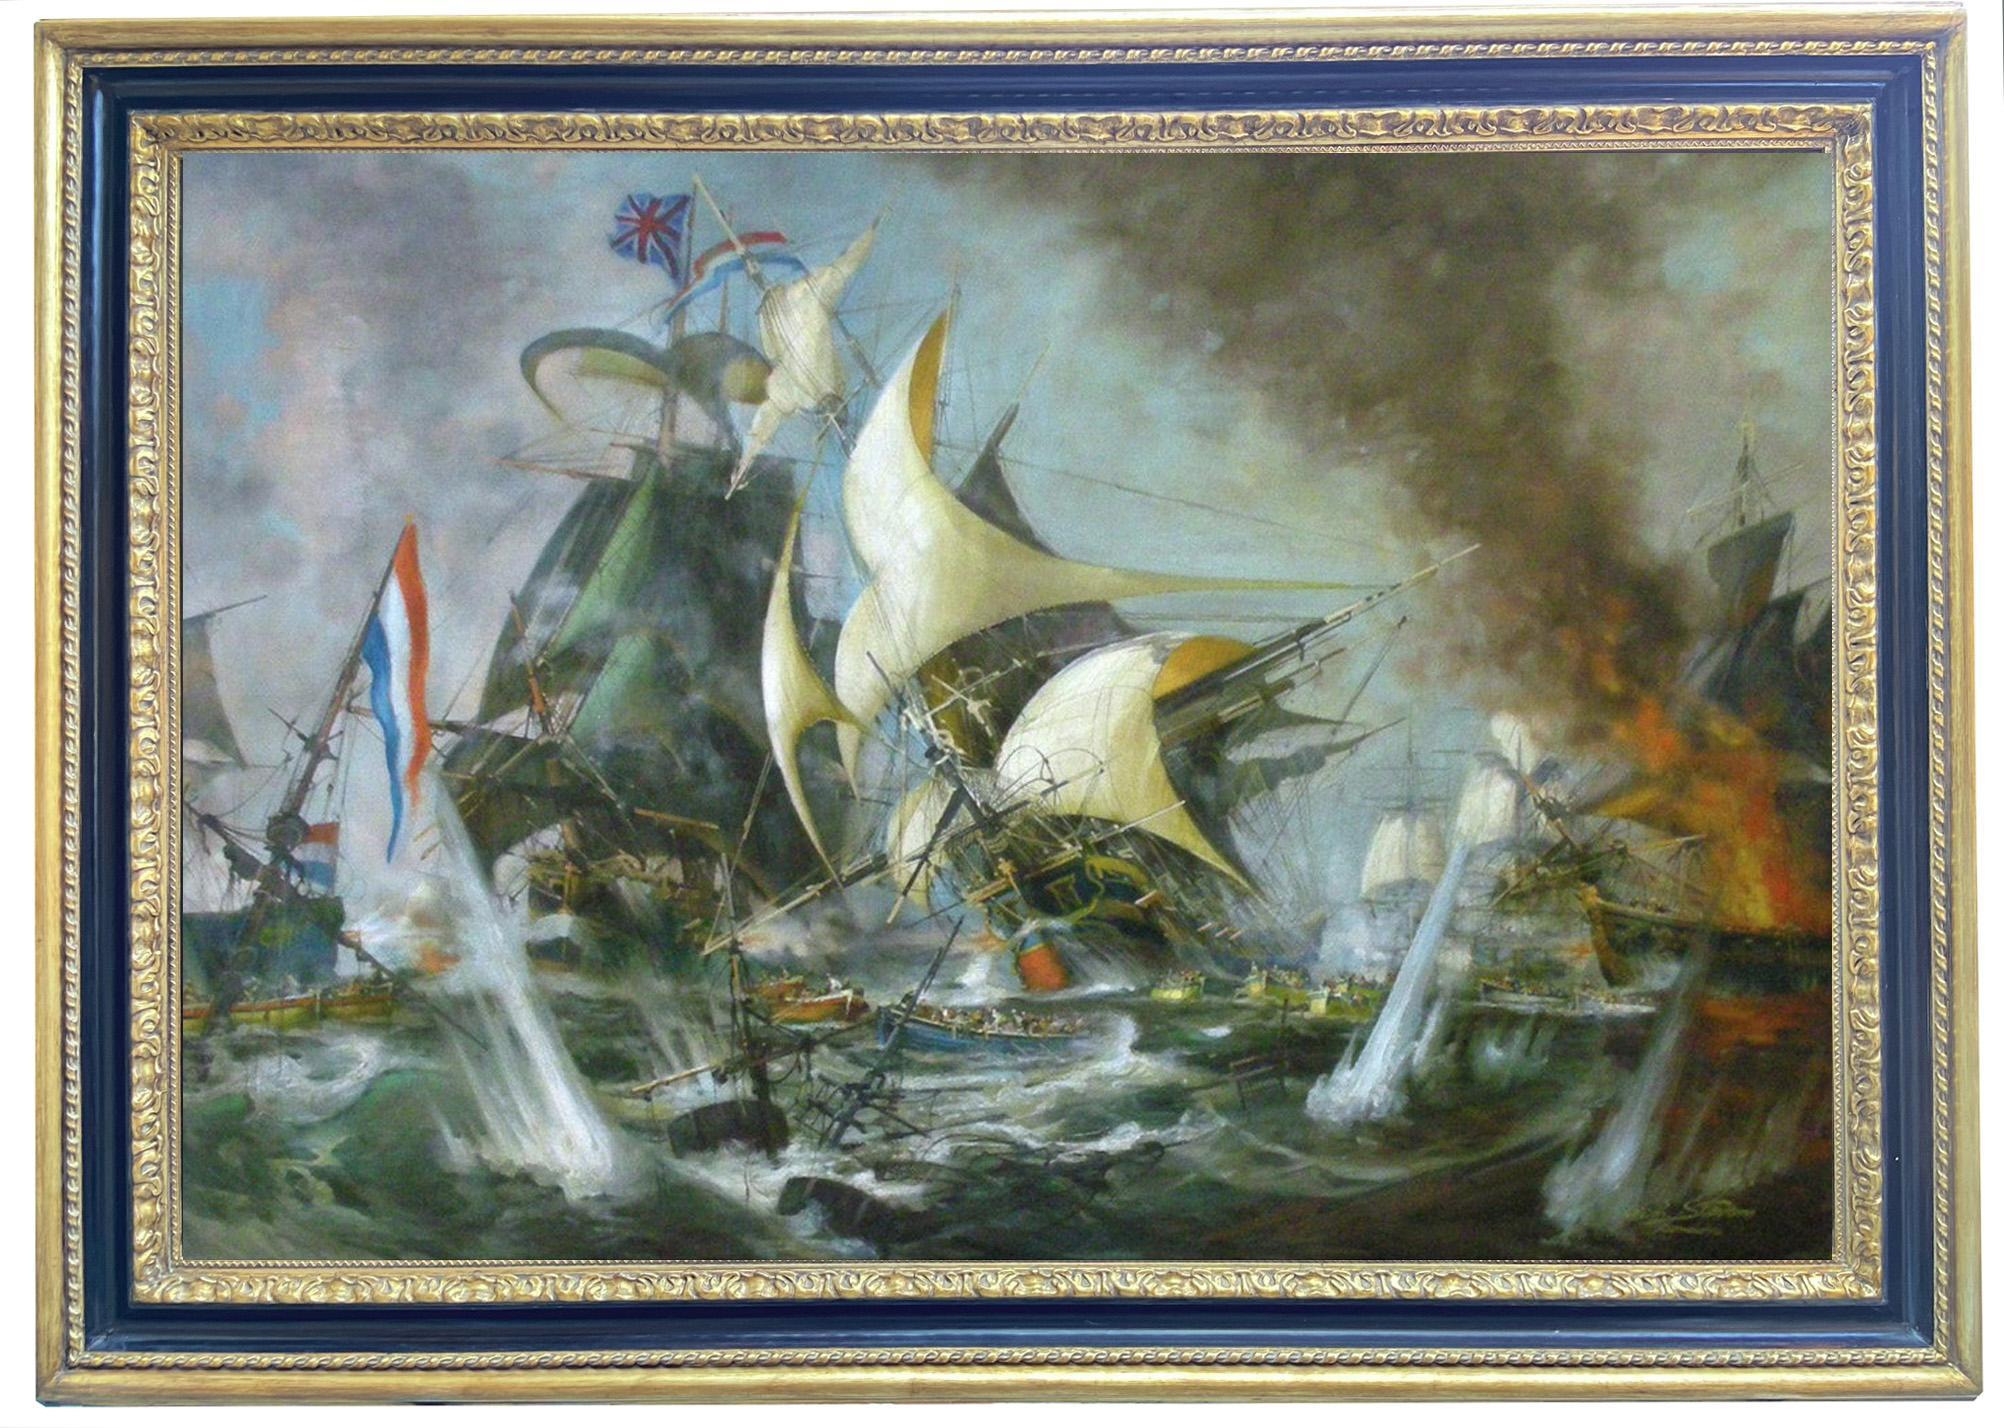 SEA BATTLE - English School - Italian Sailing Boat Oil on Canvas Painting